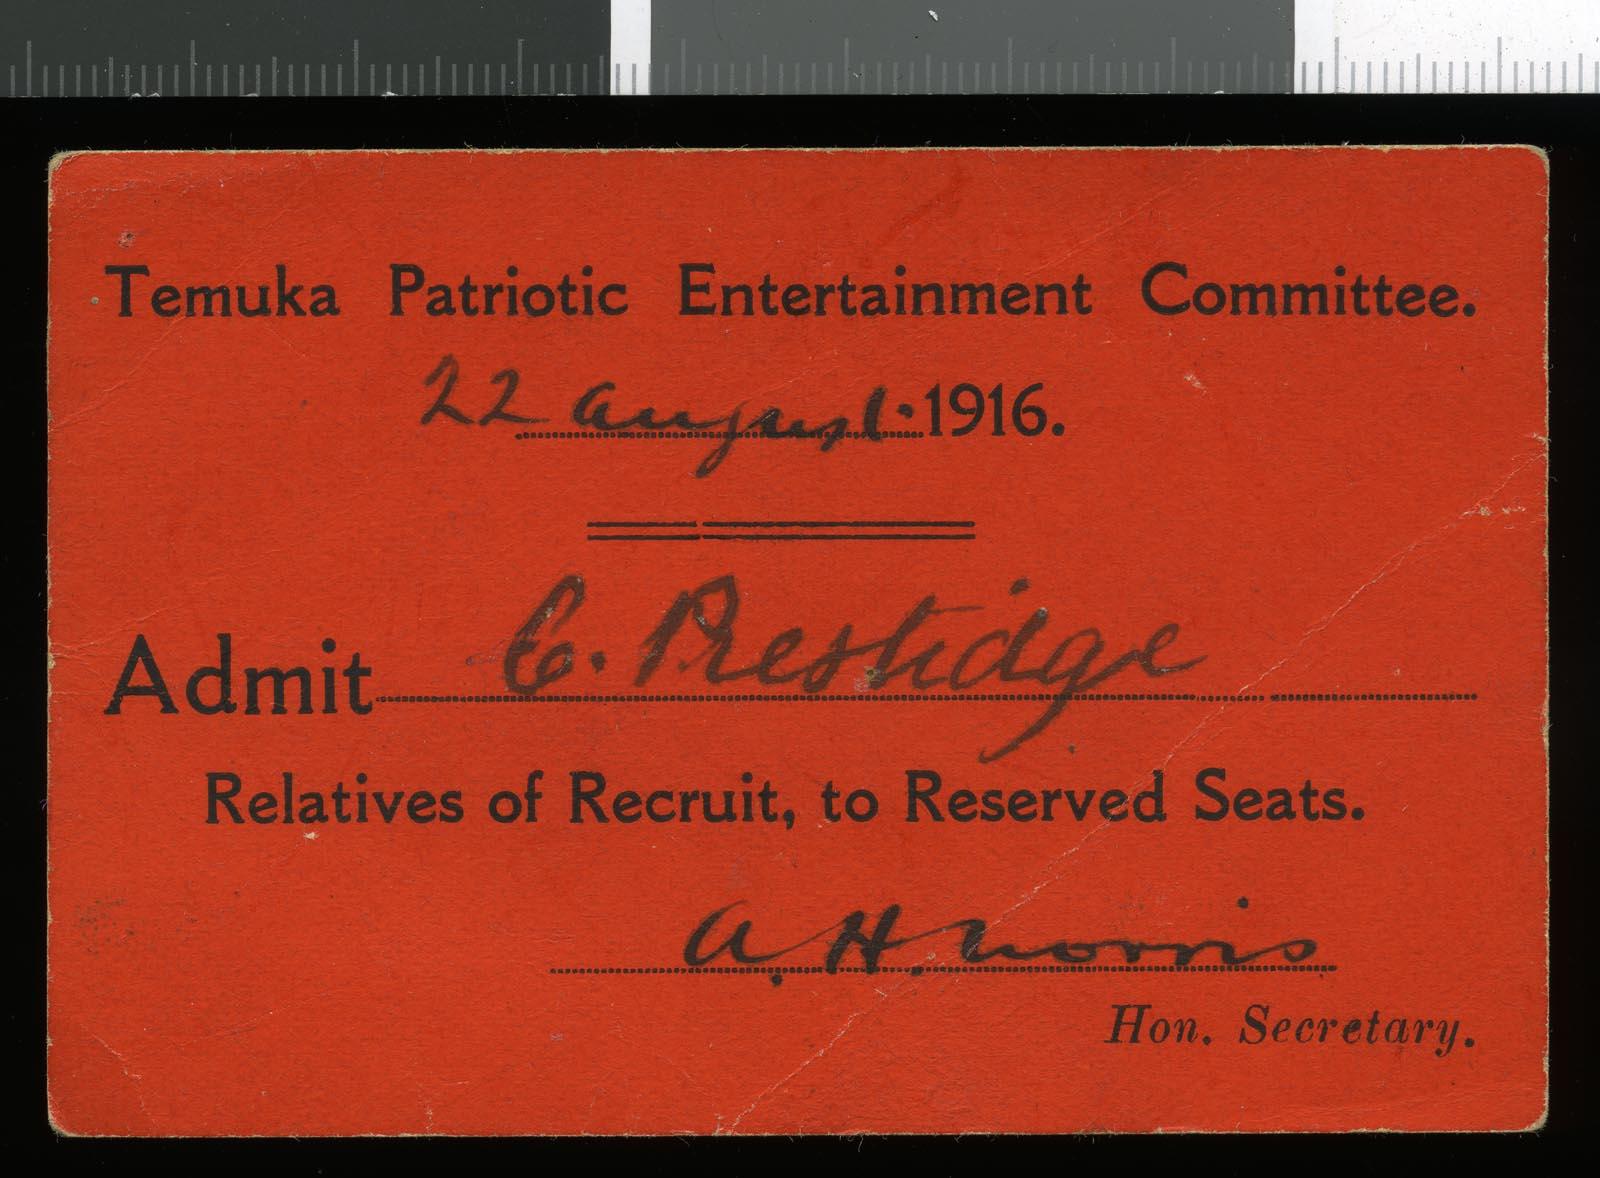 Temuka Patriotic Entertainment Committee ticket, dated 22 August 1916